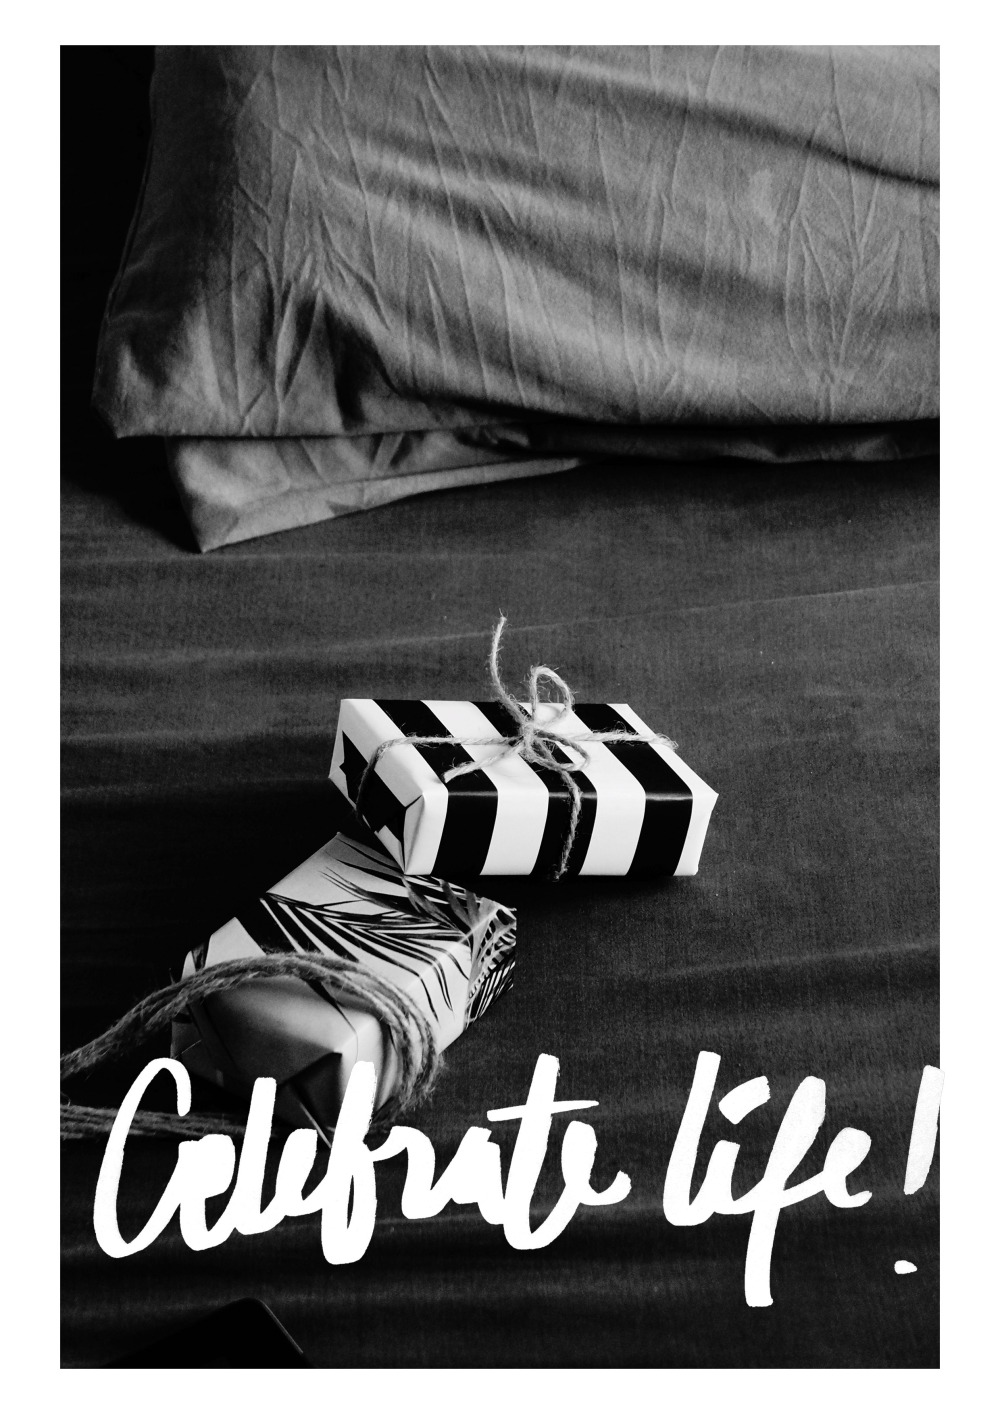 celebratelife1